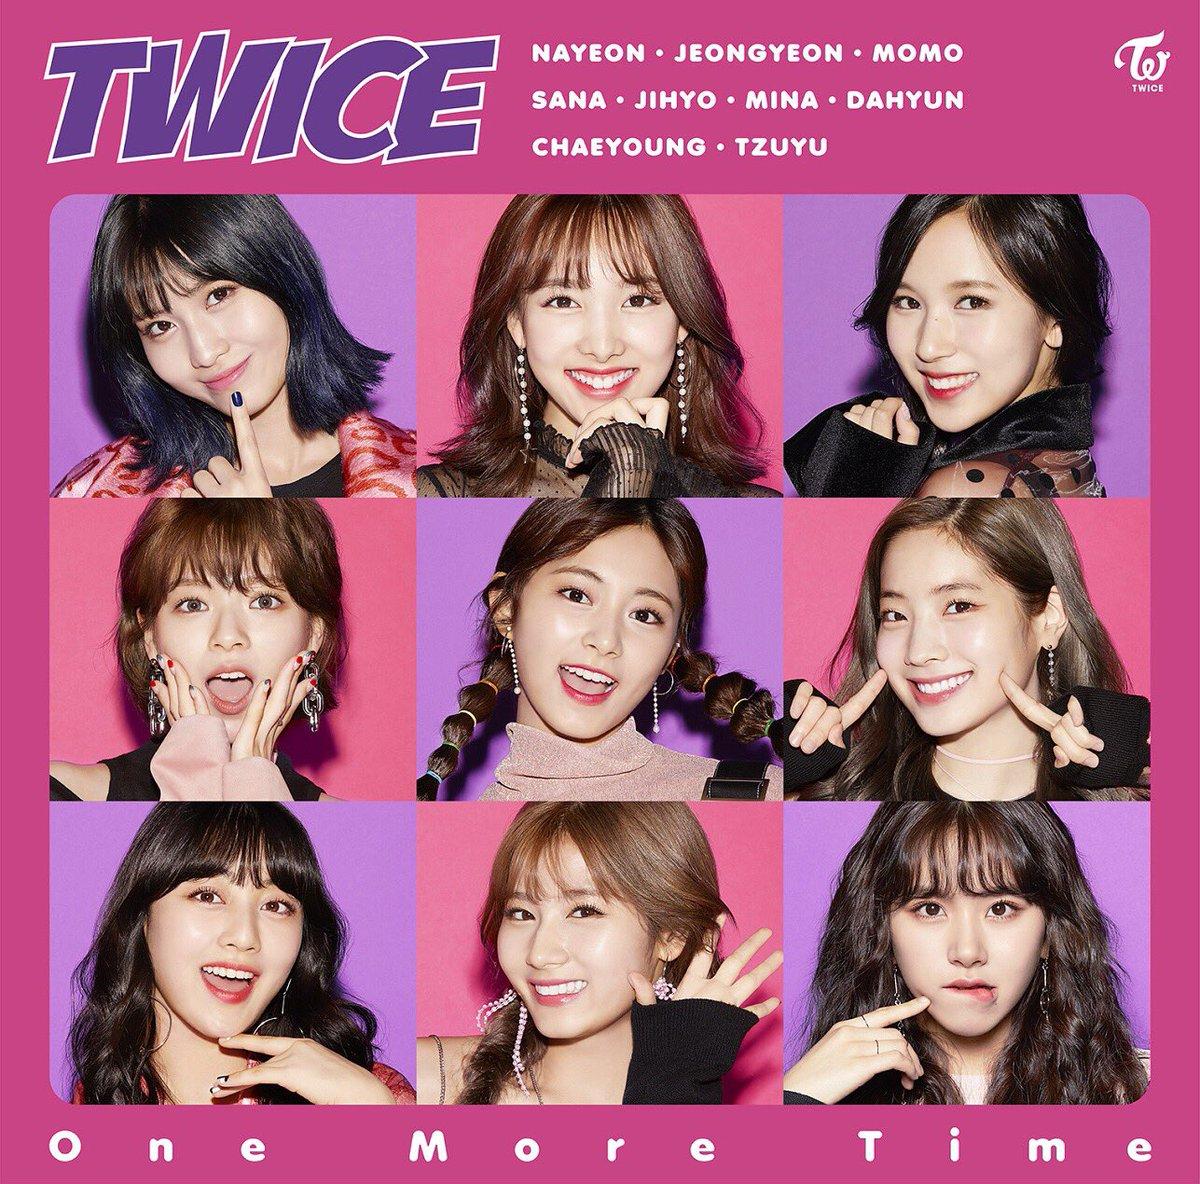 20180128.2102.3 TWICE - One More Time (Type B) (DVD.iso) (JPOP.ru) cover 1.jpg